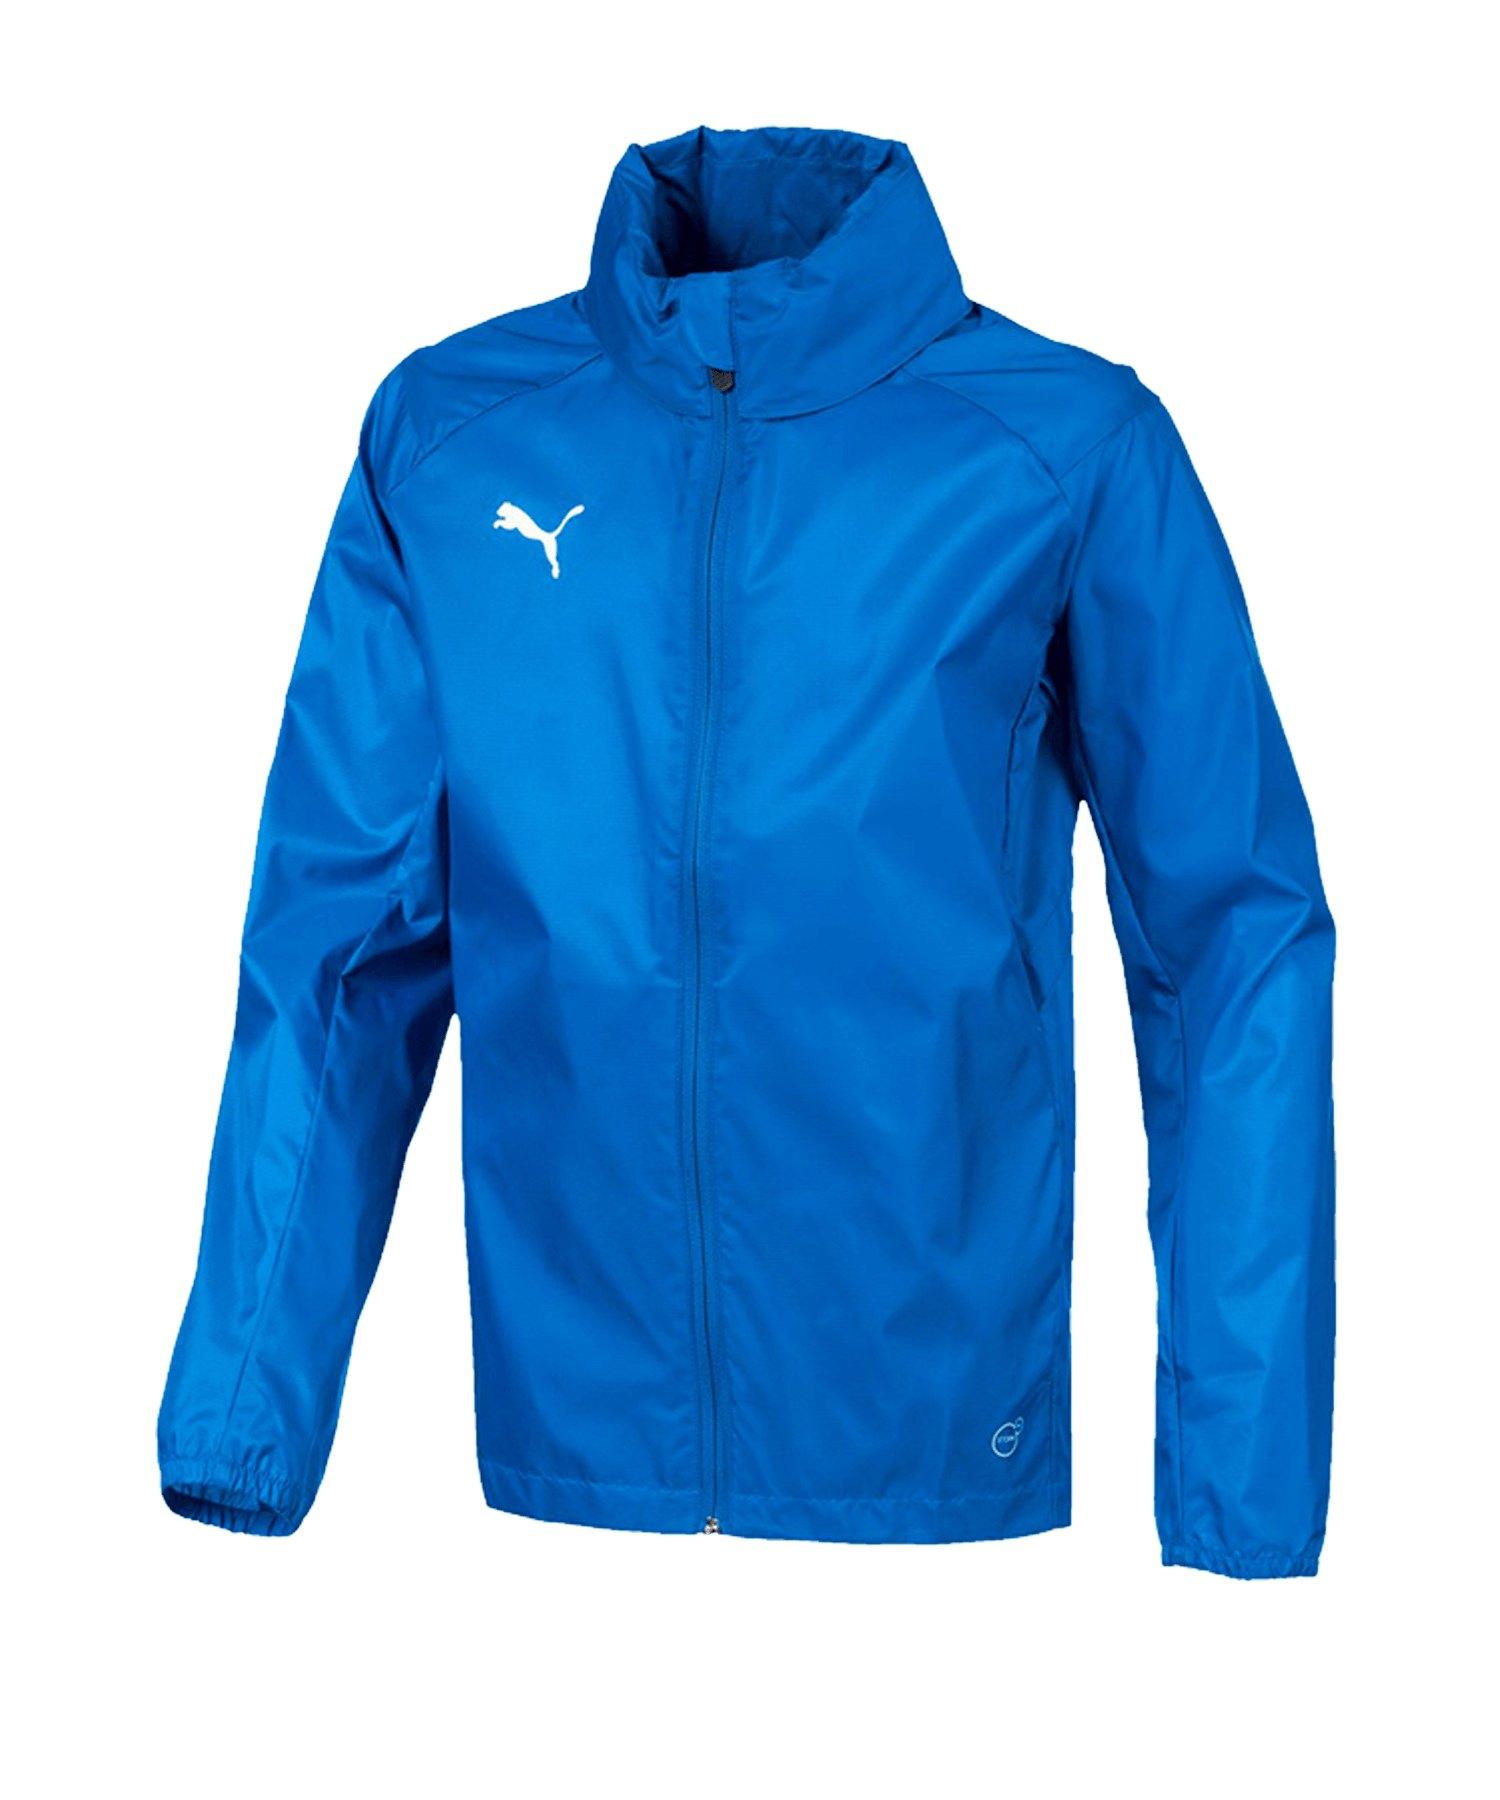 f9baaf8bf417 PUMA LIGA Training Rain Jacket Regenjacke Kids F02 - blau